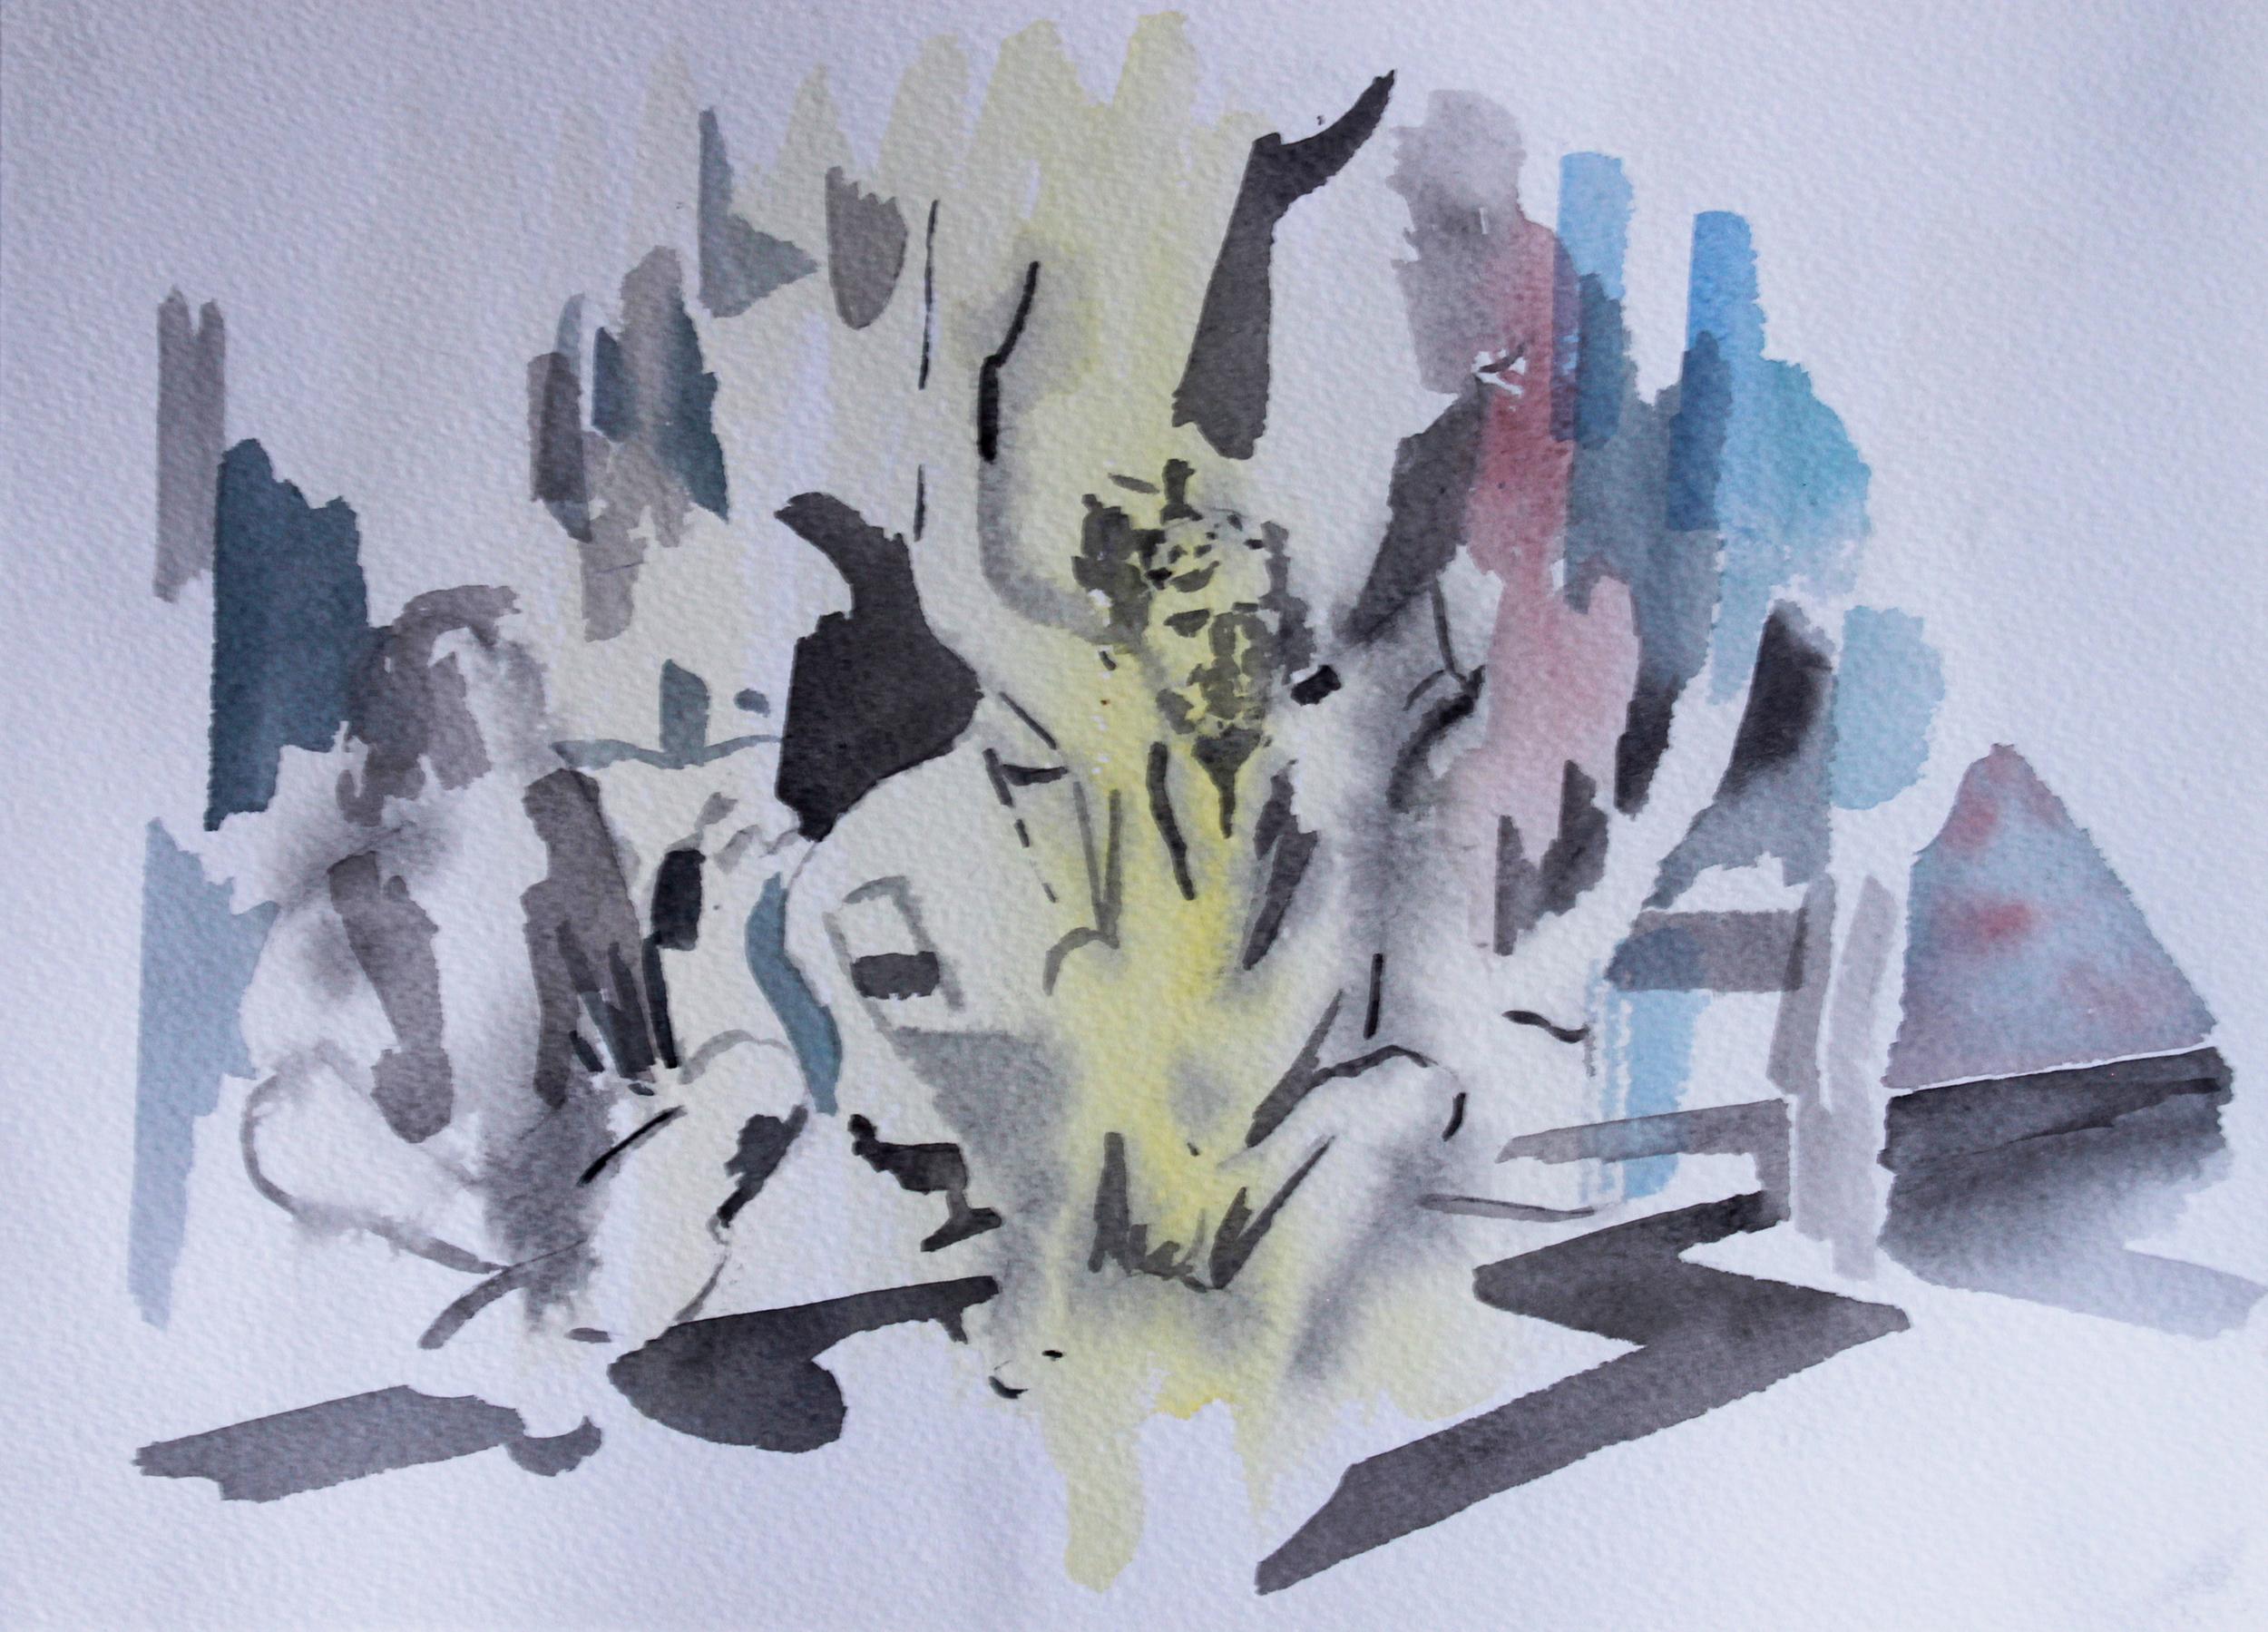 PROTEST, Watercolour on paper, 30.5 x 40.5cm, 2014